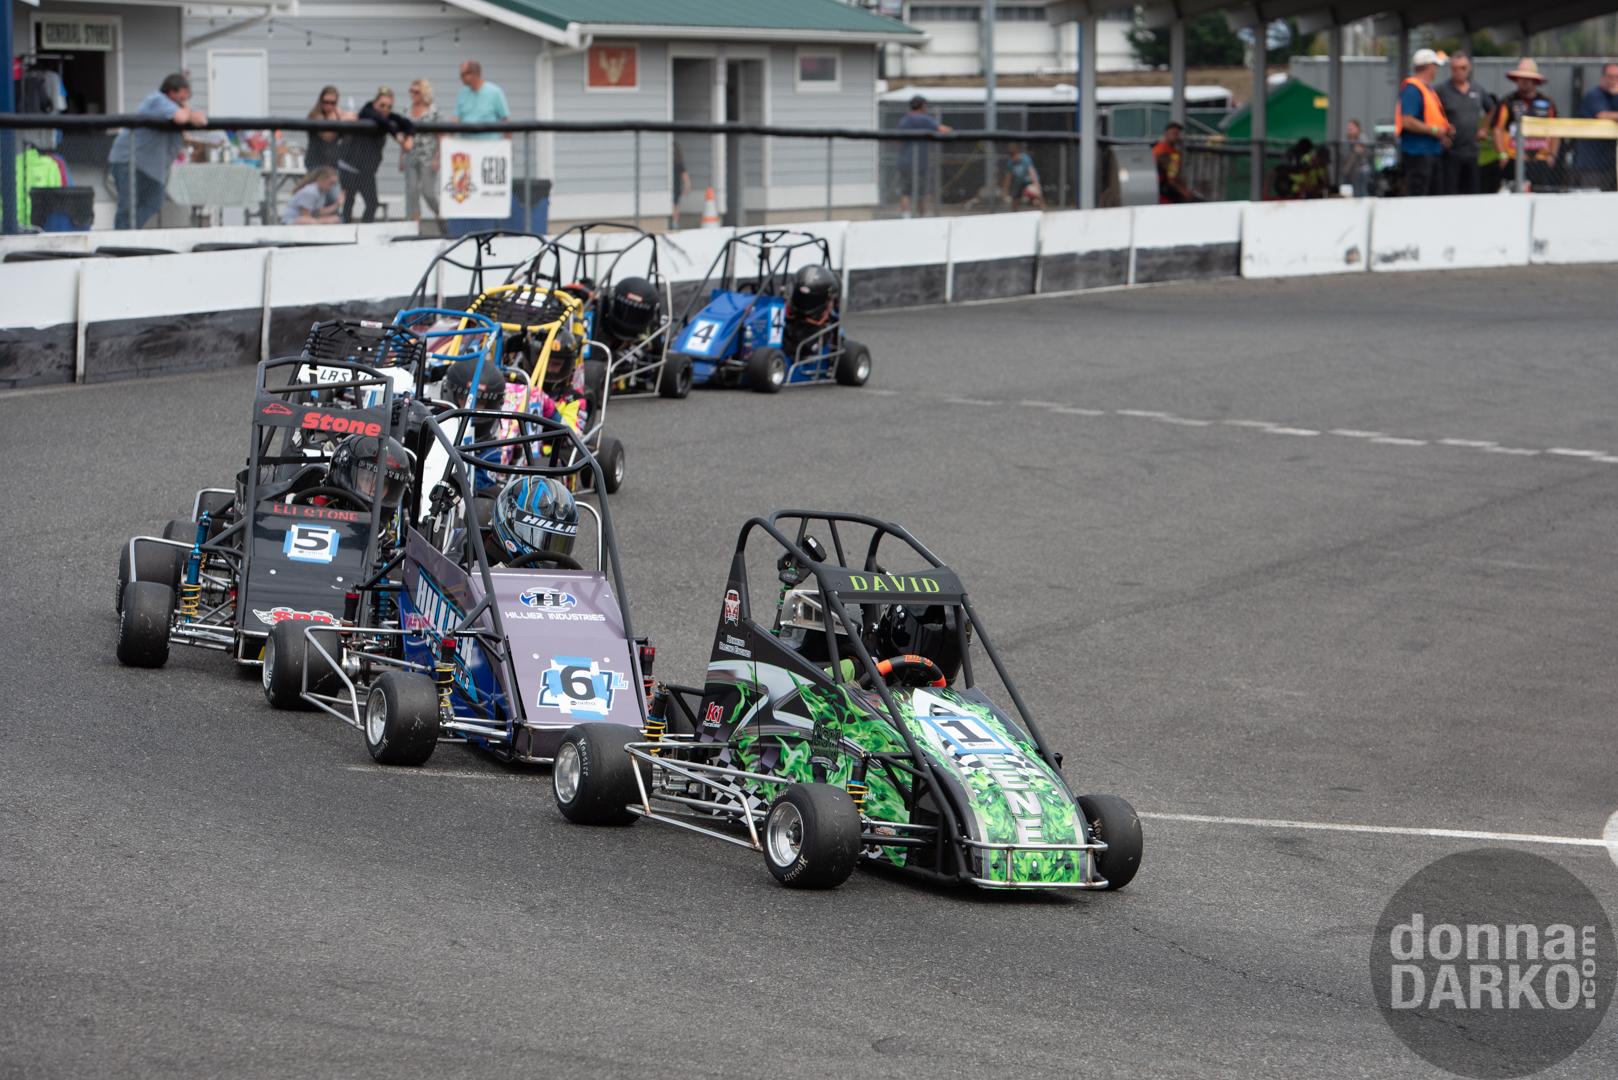 QWMA (Racing) 8-11-2019 DSC_7599.jpg